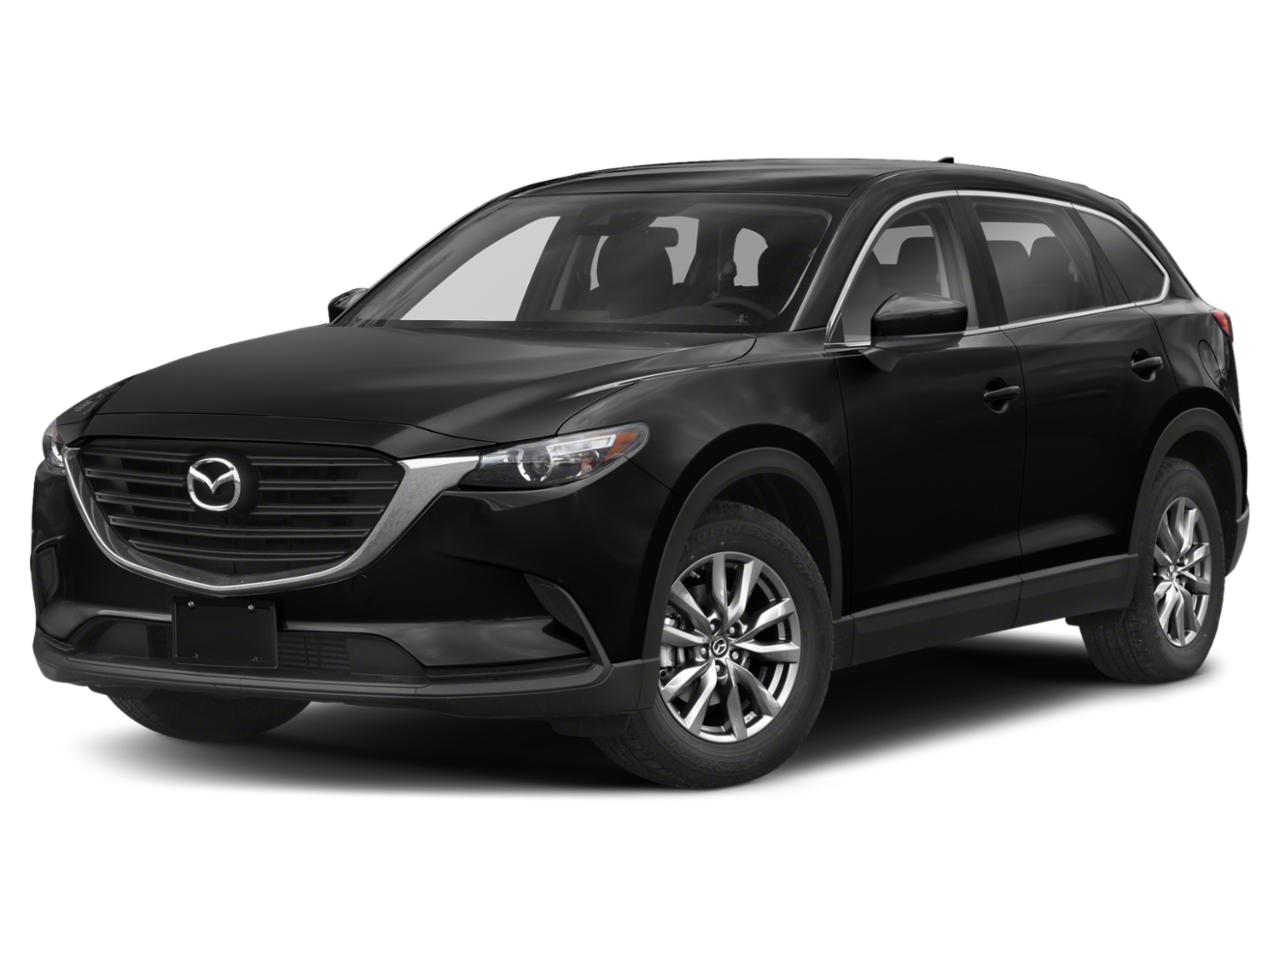 2020 Mazda CX-9 Vehicle Photo in Plainfield, IL 60586